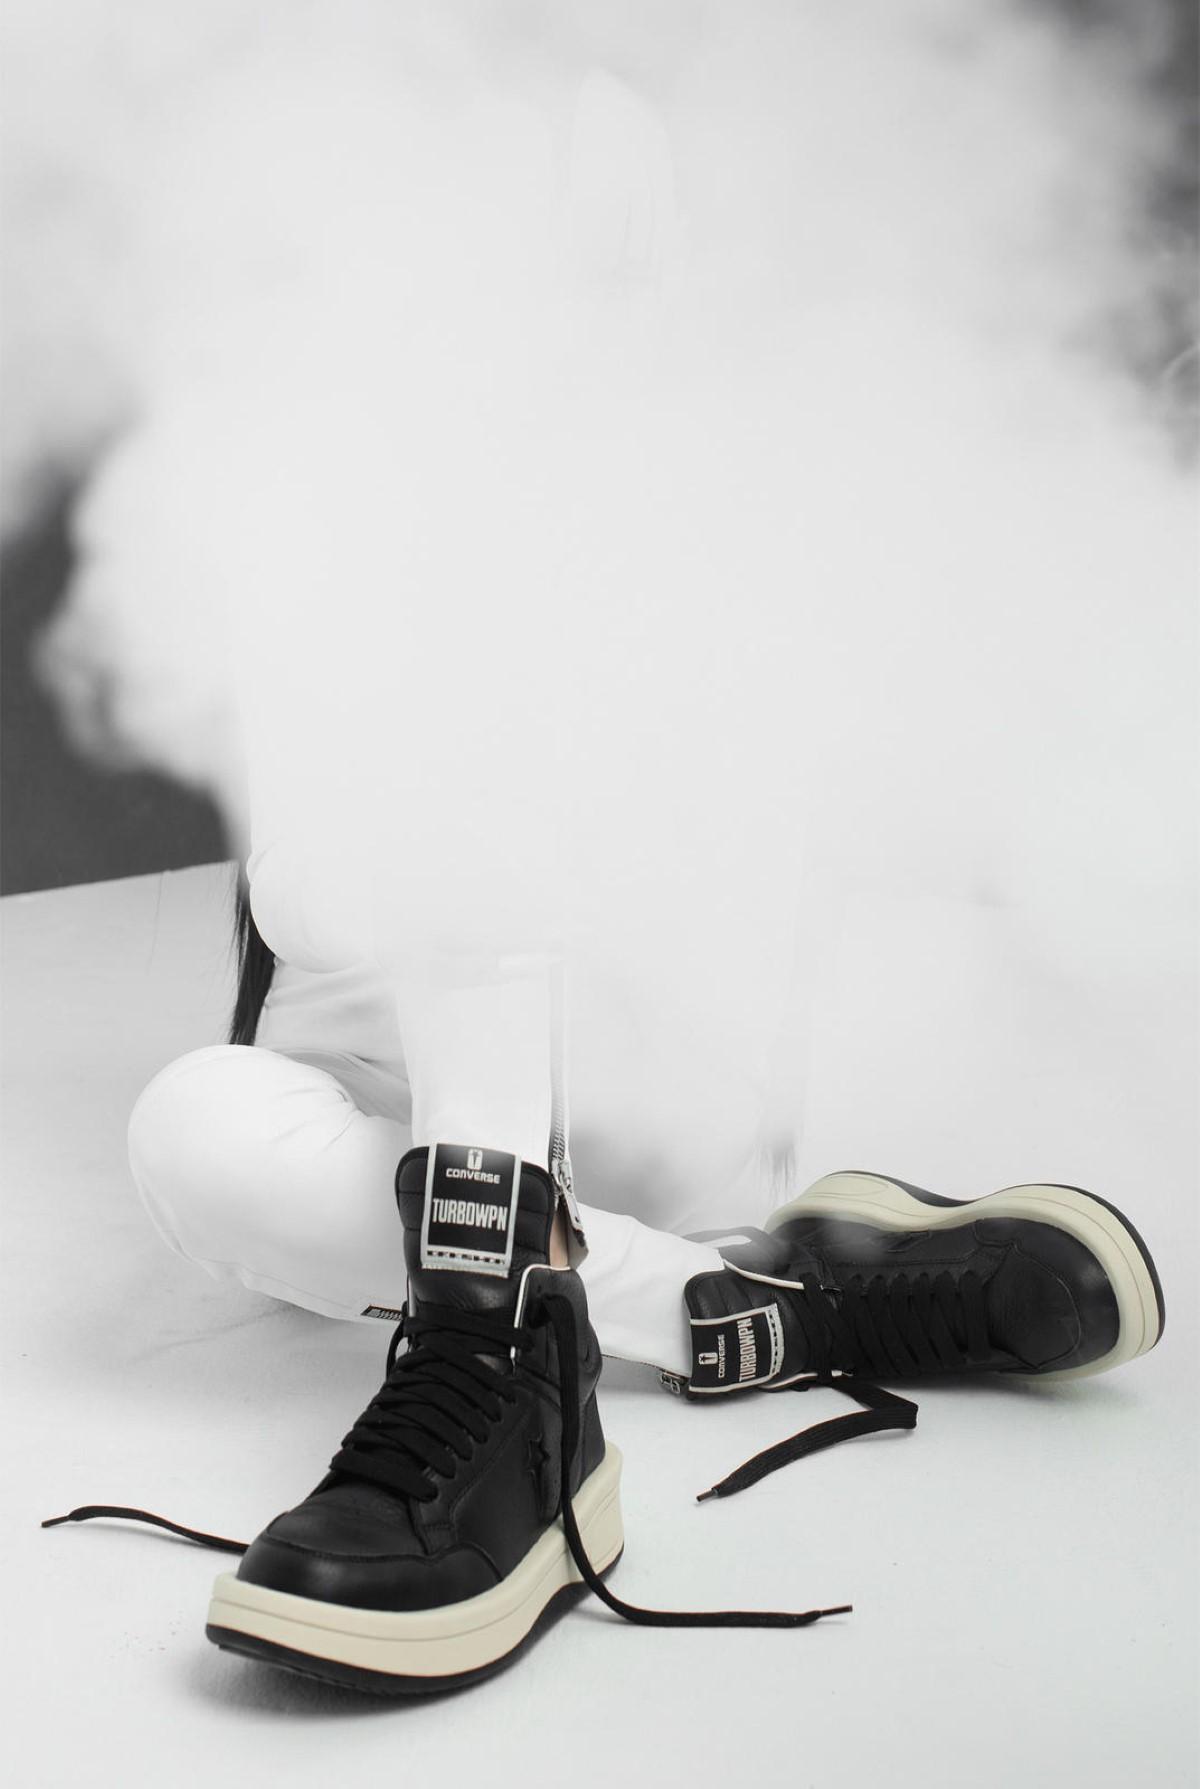 Rick Owens x Converse DRKSHDW TURBOWPN